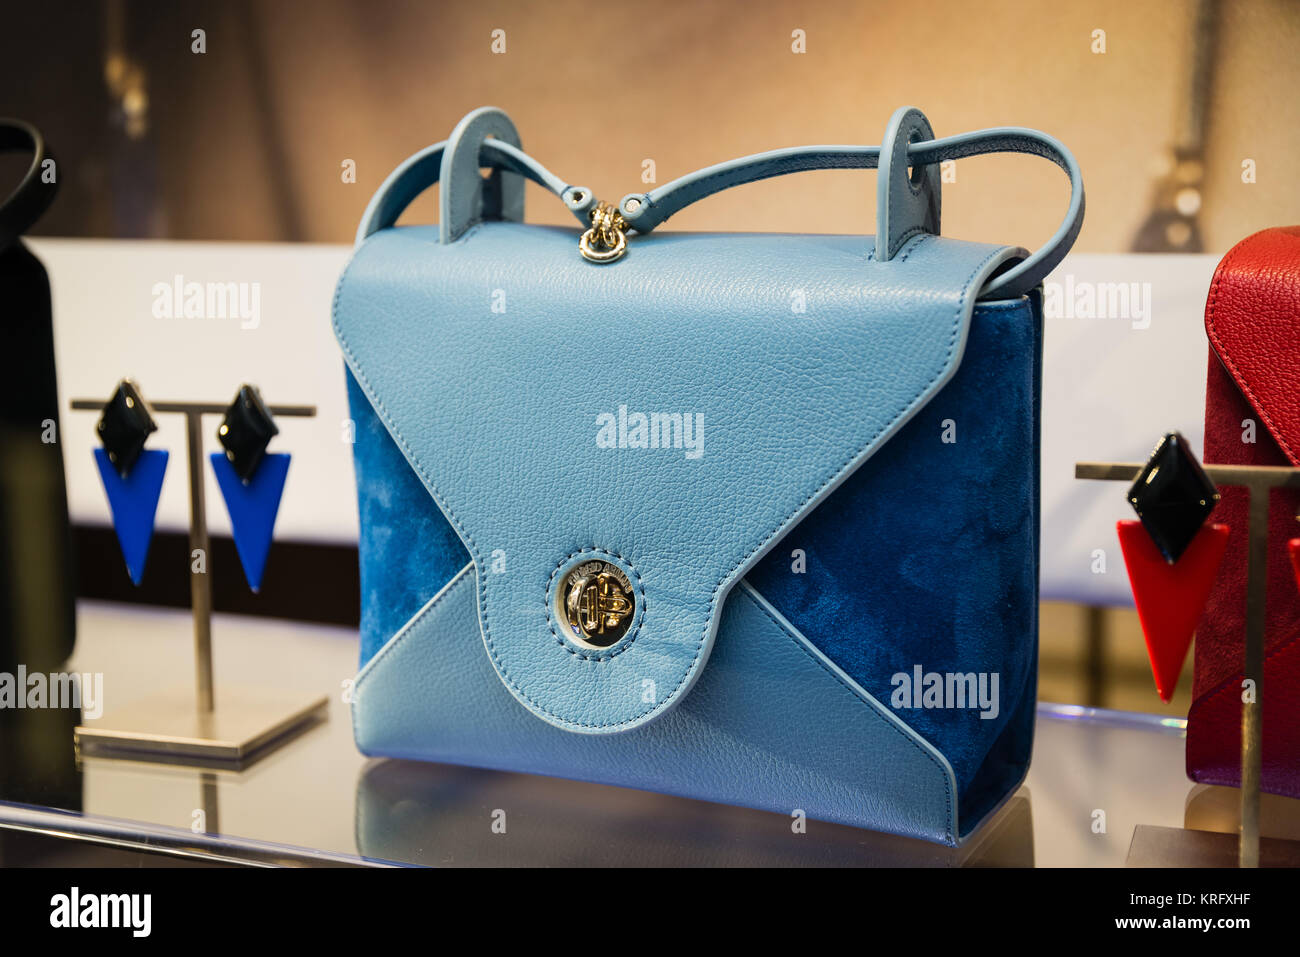 Stock Immagini Shop Fotos amp; Alamy Armani SqZCOn